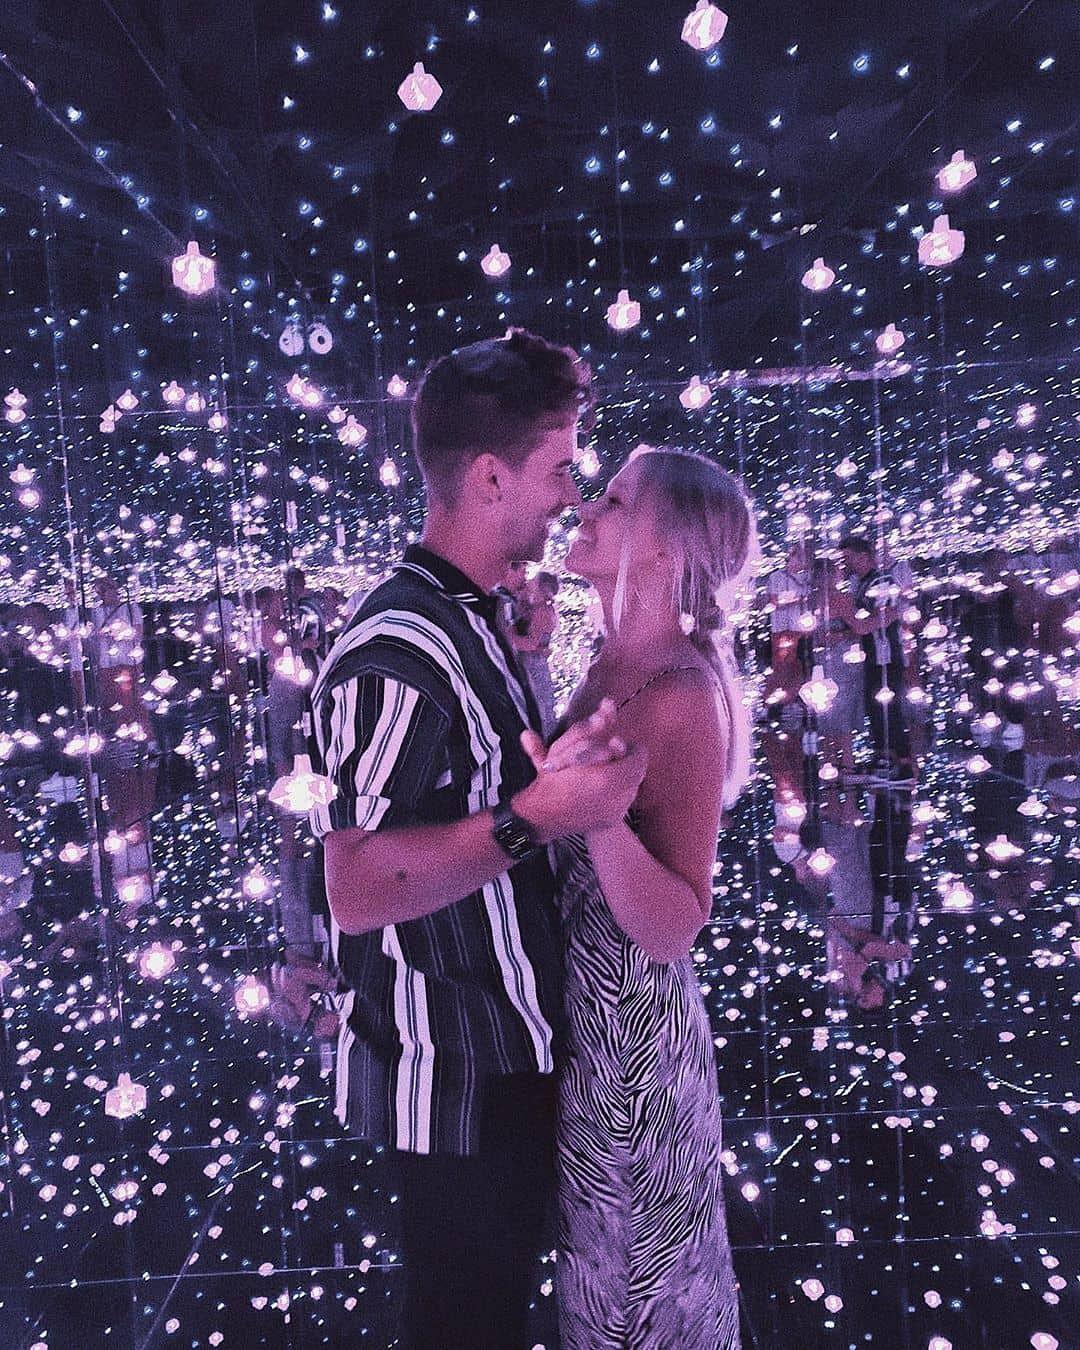 Good Date Night Spots / The Best Romantic Date Night Spots